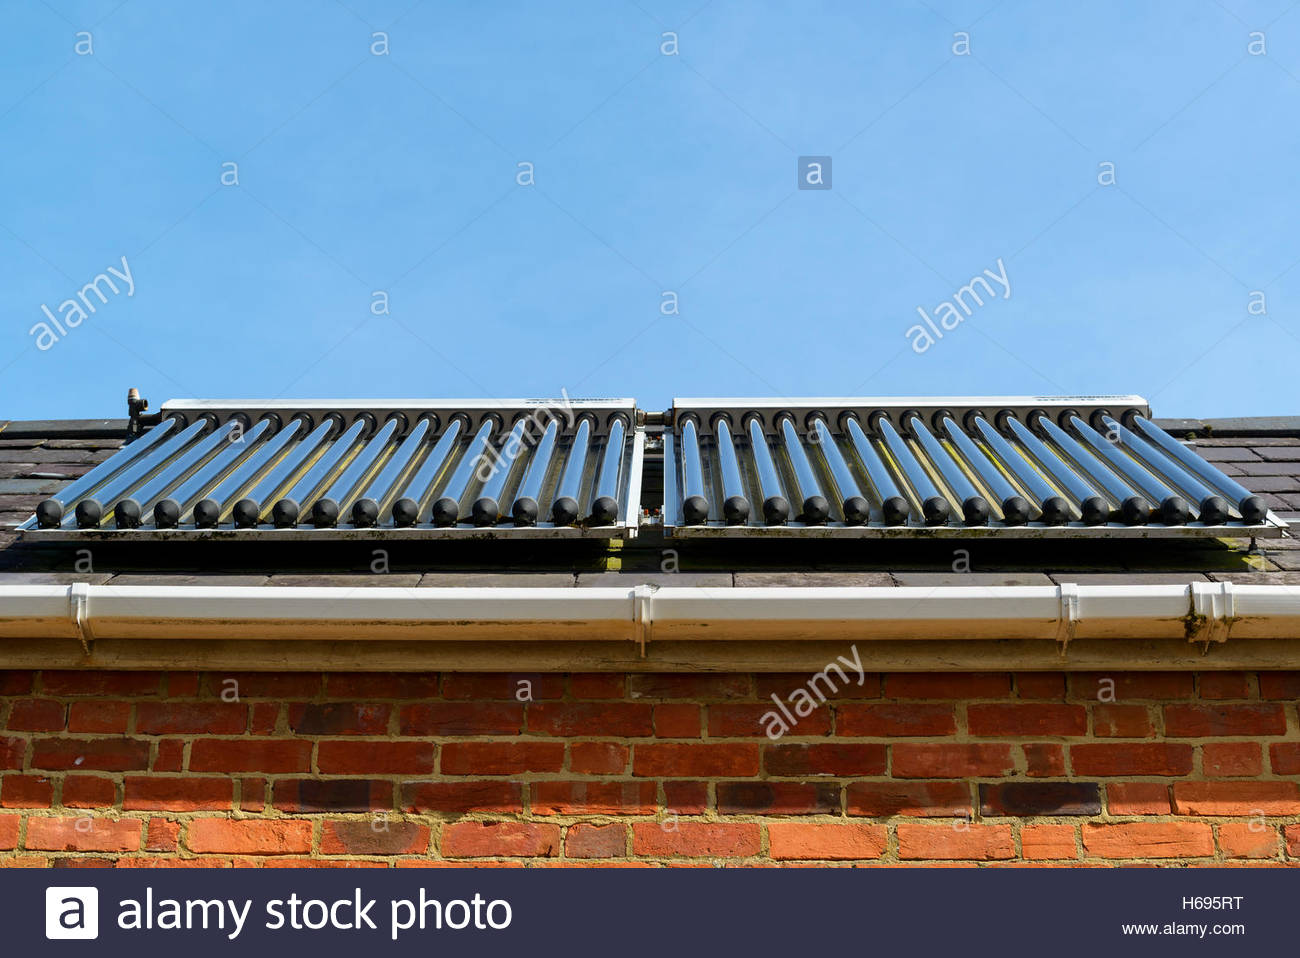 Solar evacuated tube collector panels, Dorset, England, Britain, UK - Stock Image